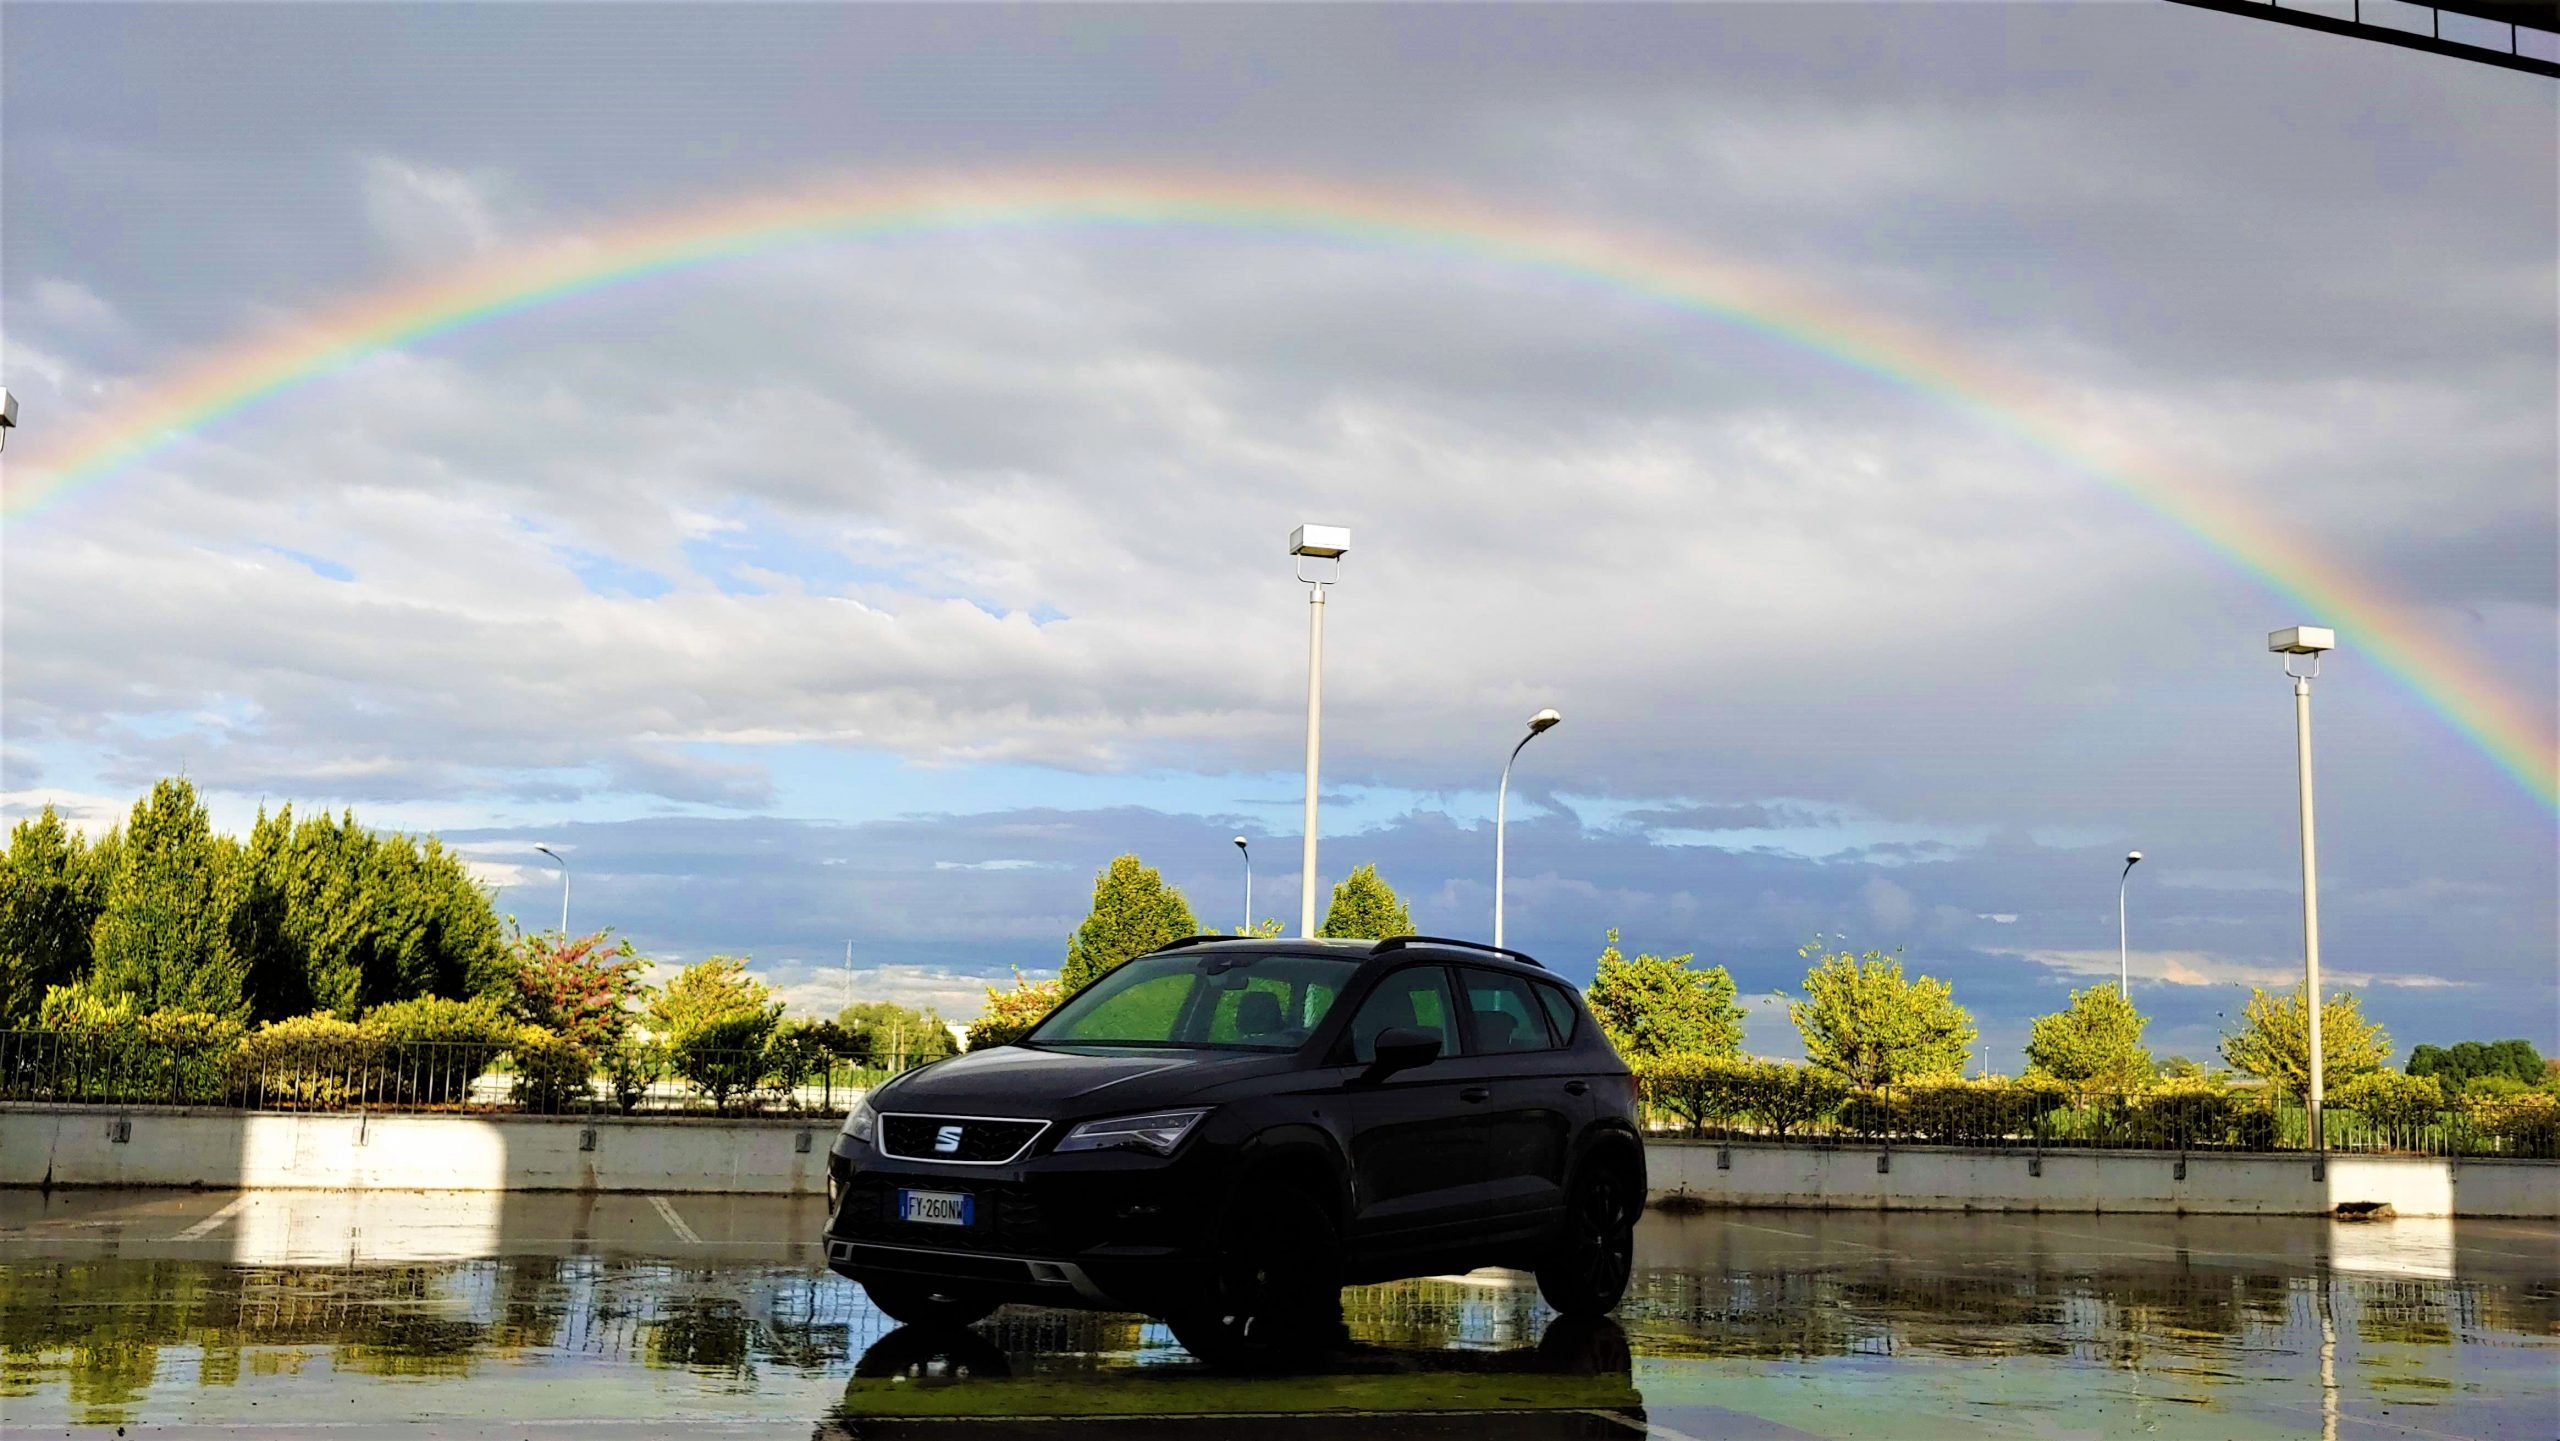 SEAT Ateca arcobaleno orizzontale